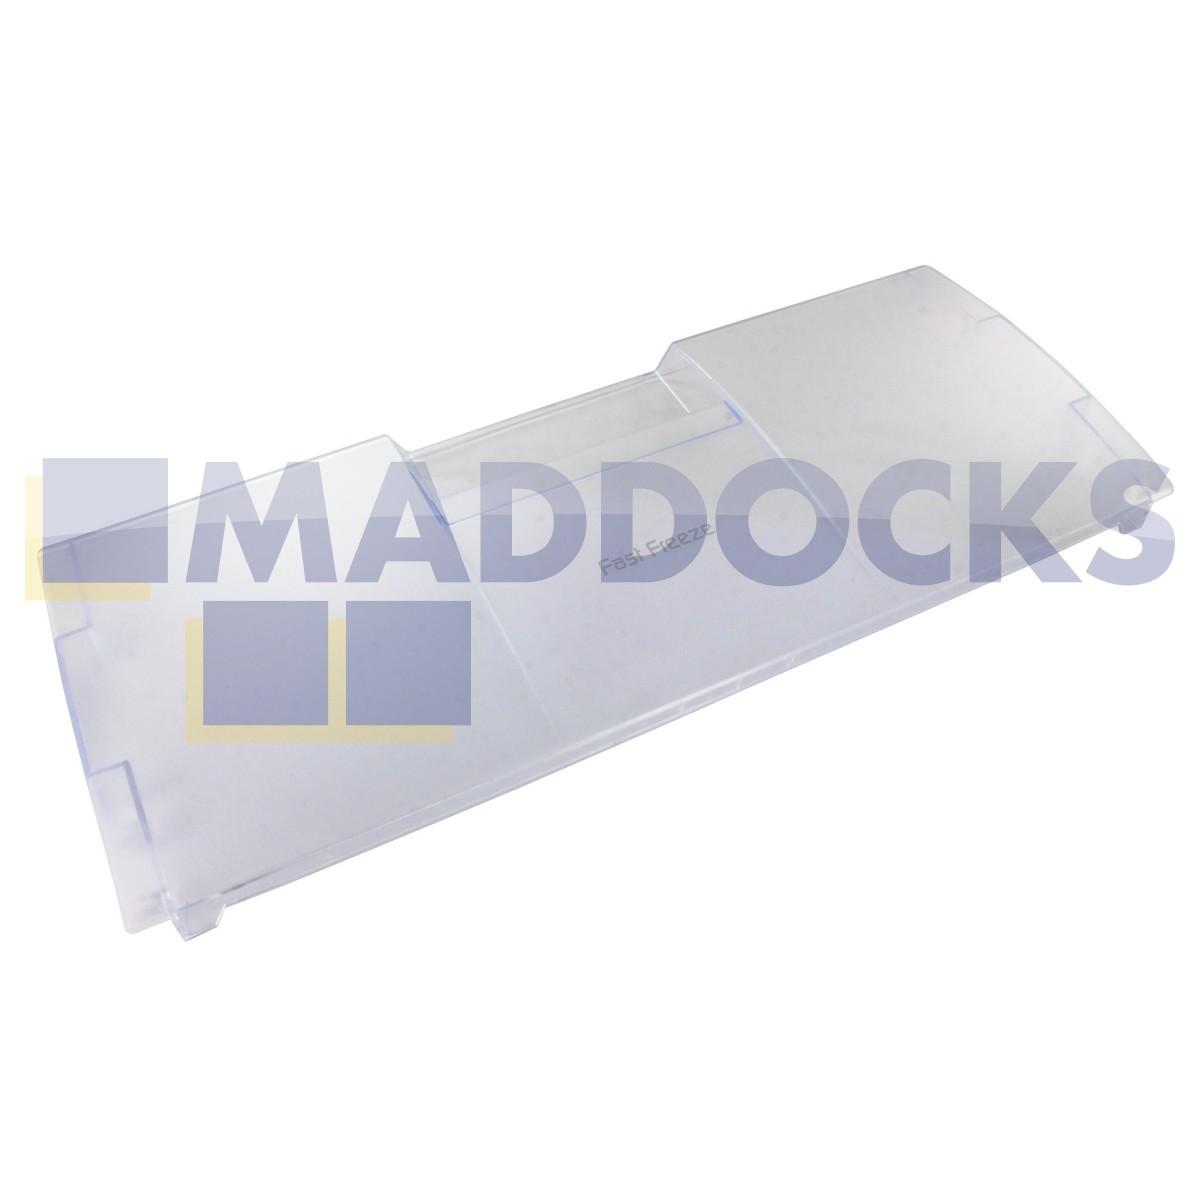 TimbaScrew Flange Timber Screws Black 6.7 x 150mm 200 Pack